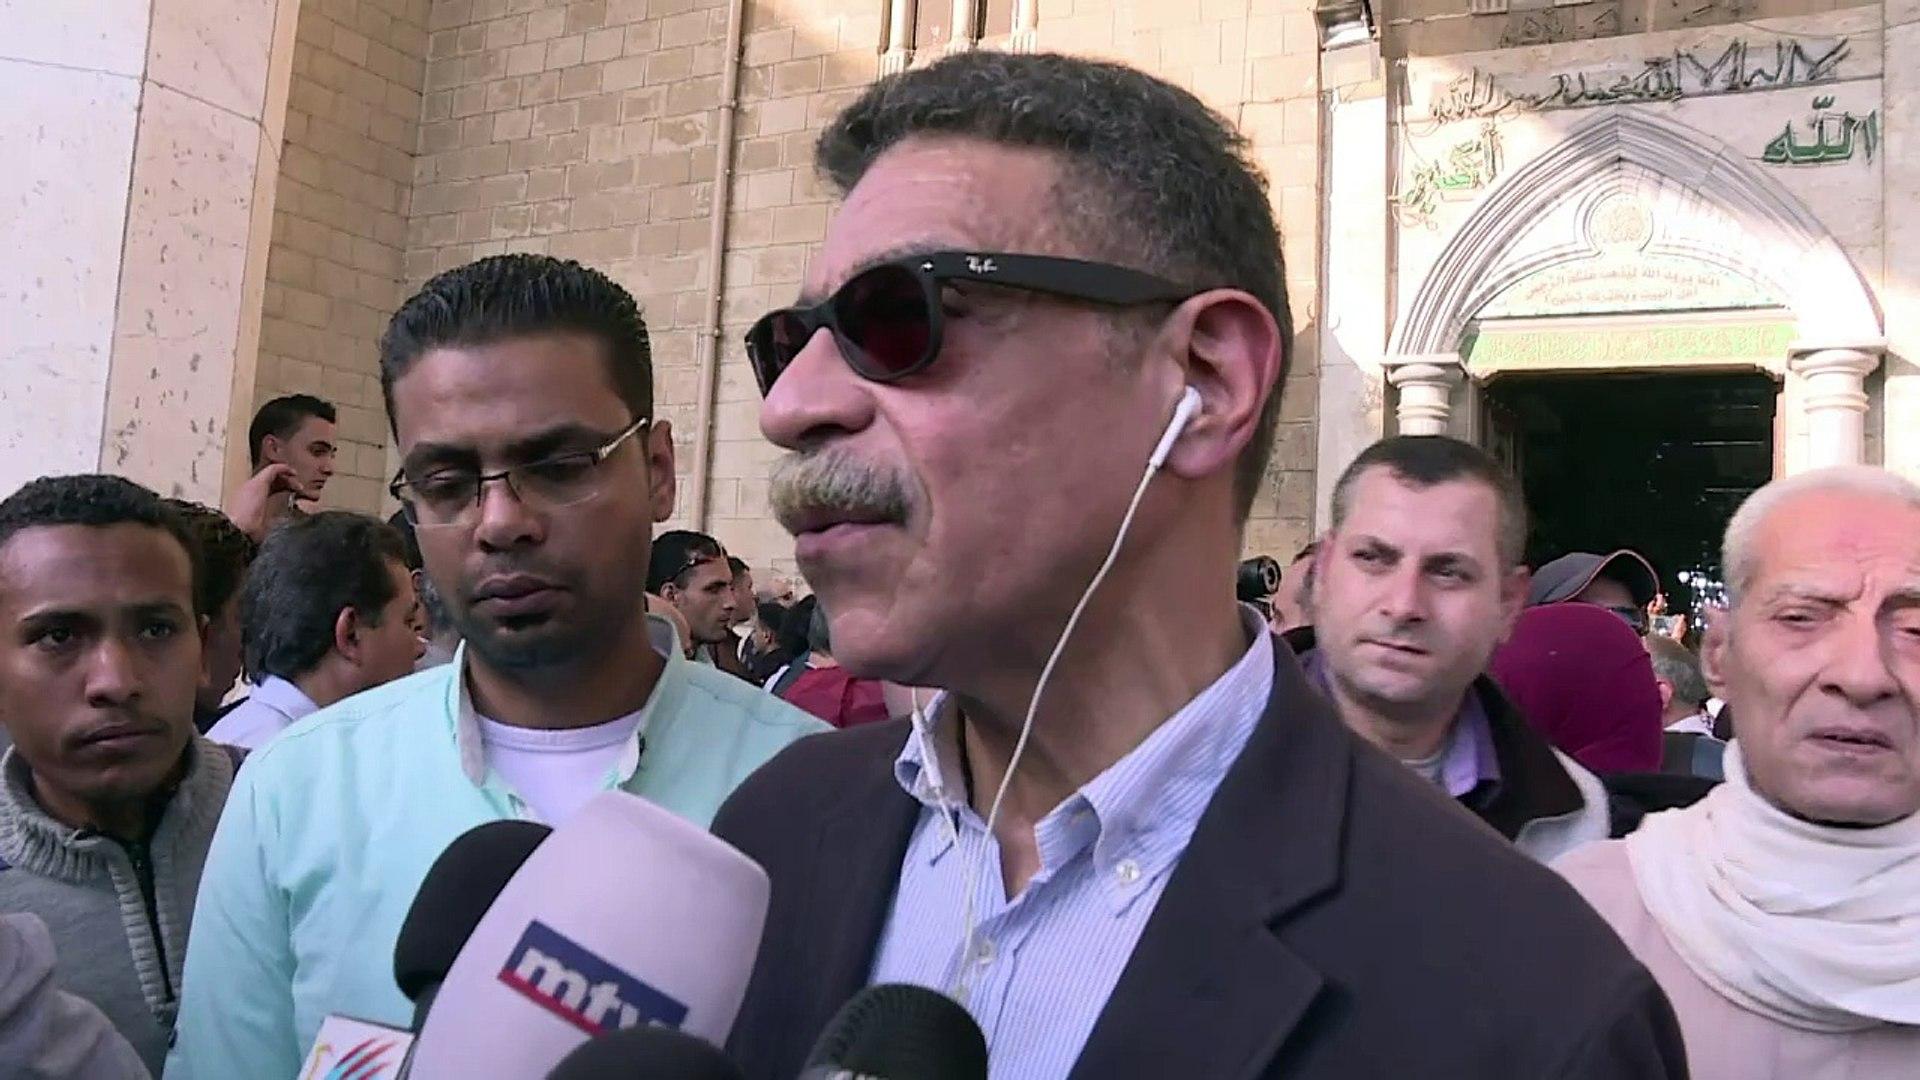 Cairo buries of veteran Egyptian journalist Heikal